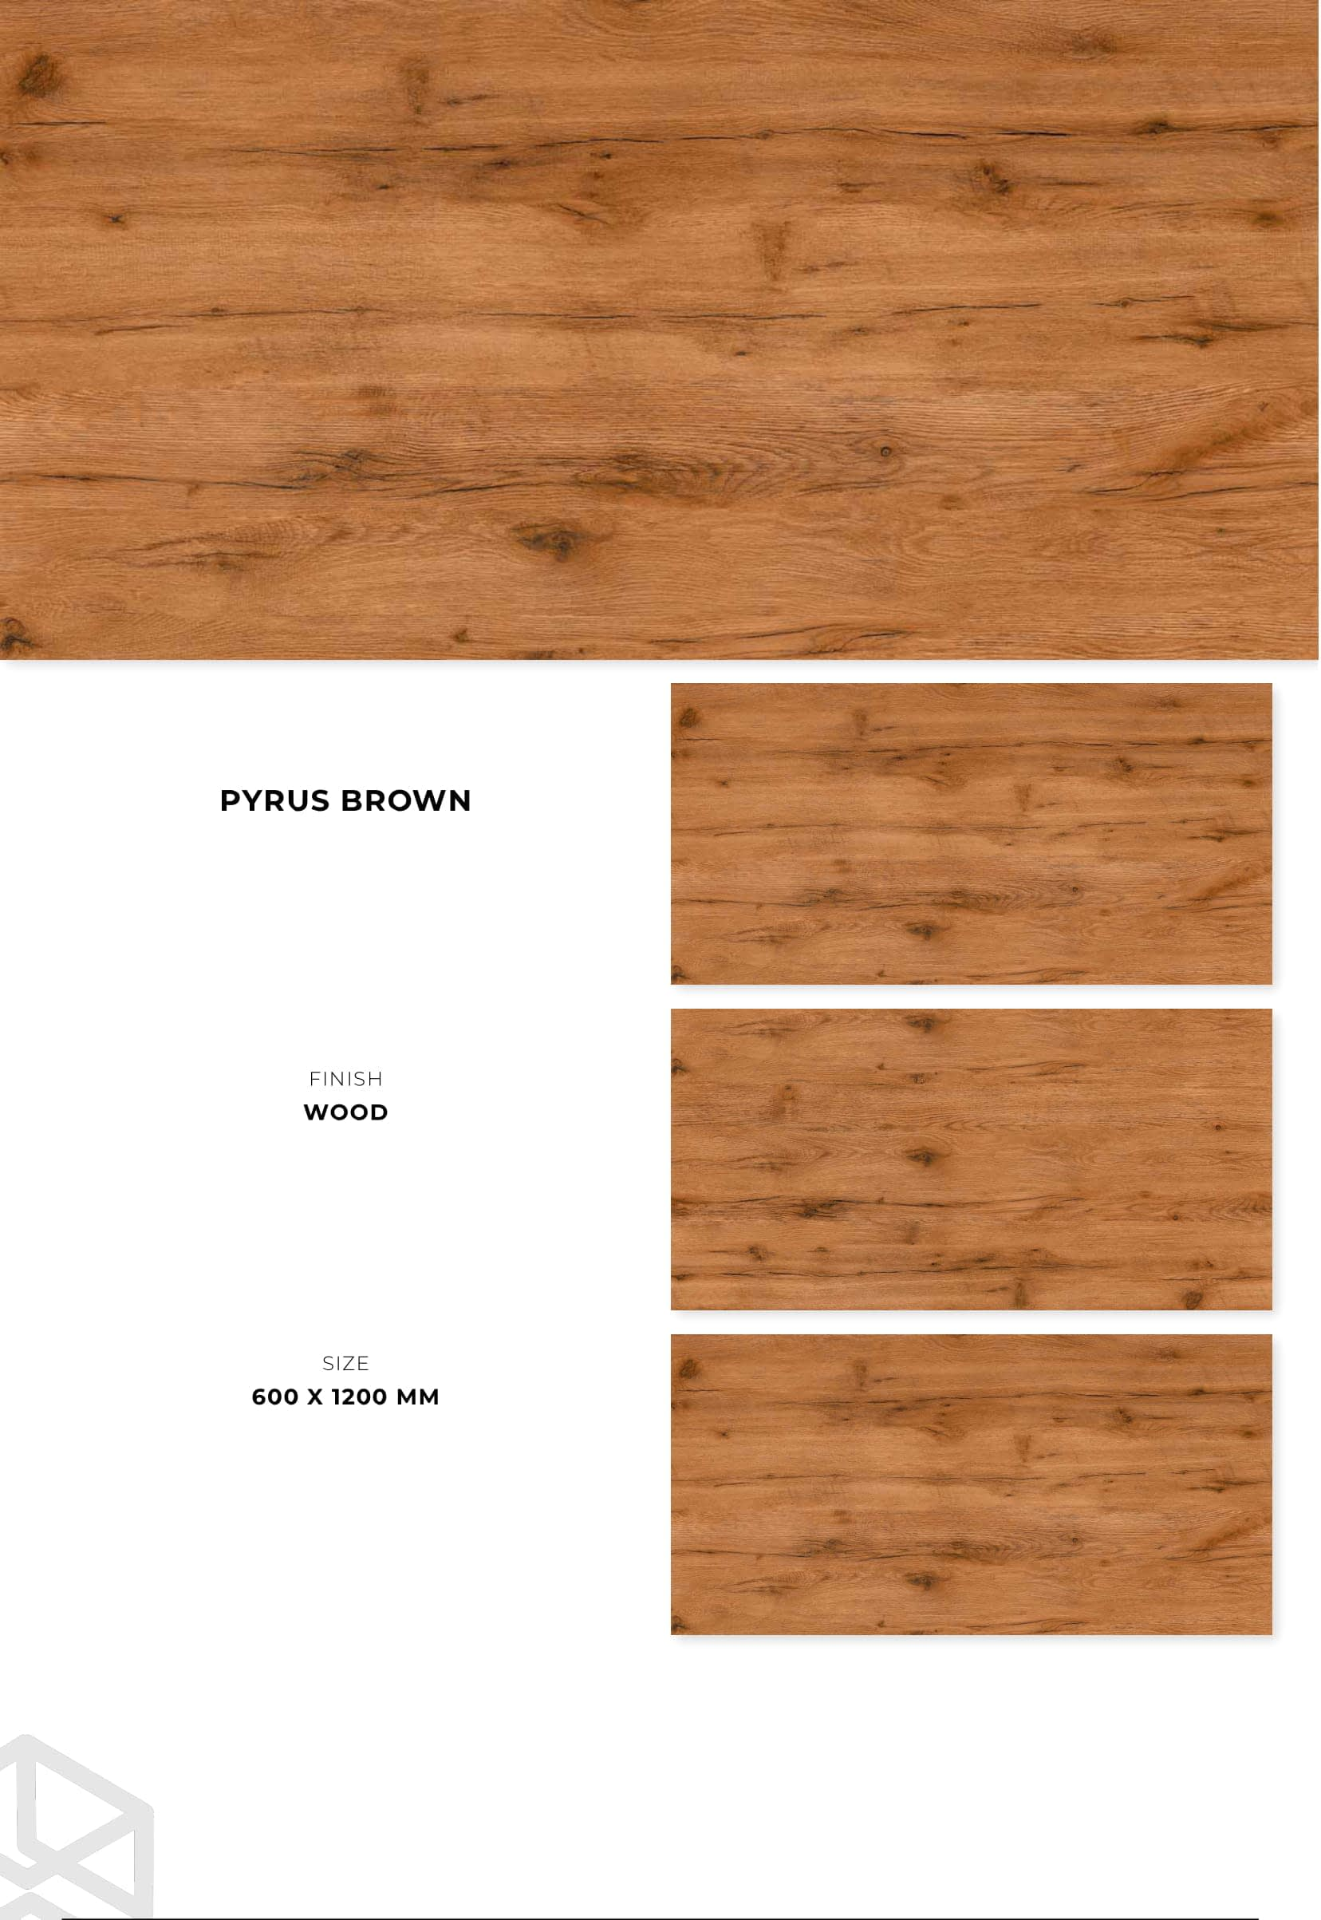 PGVT - GVT 600 X 1200 MM Wood